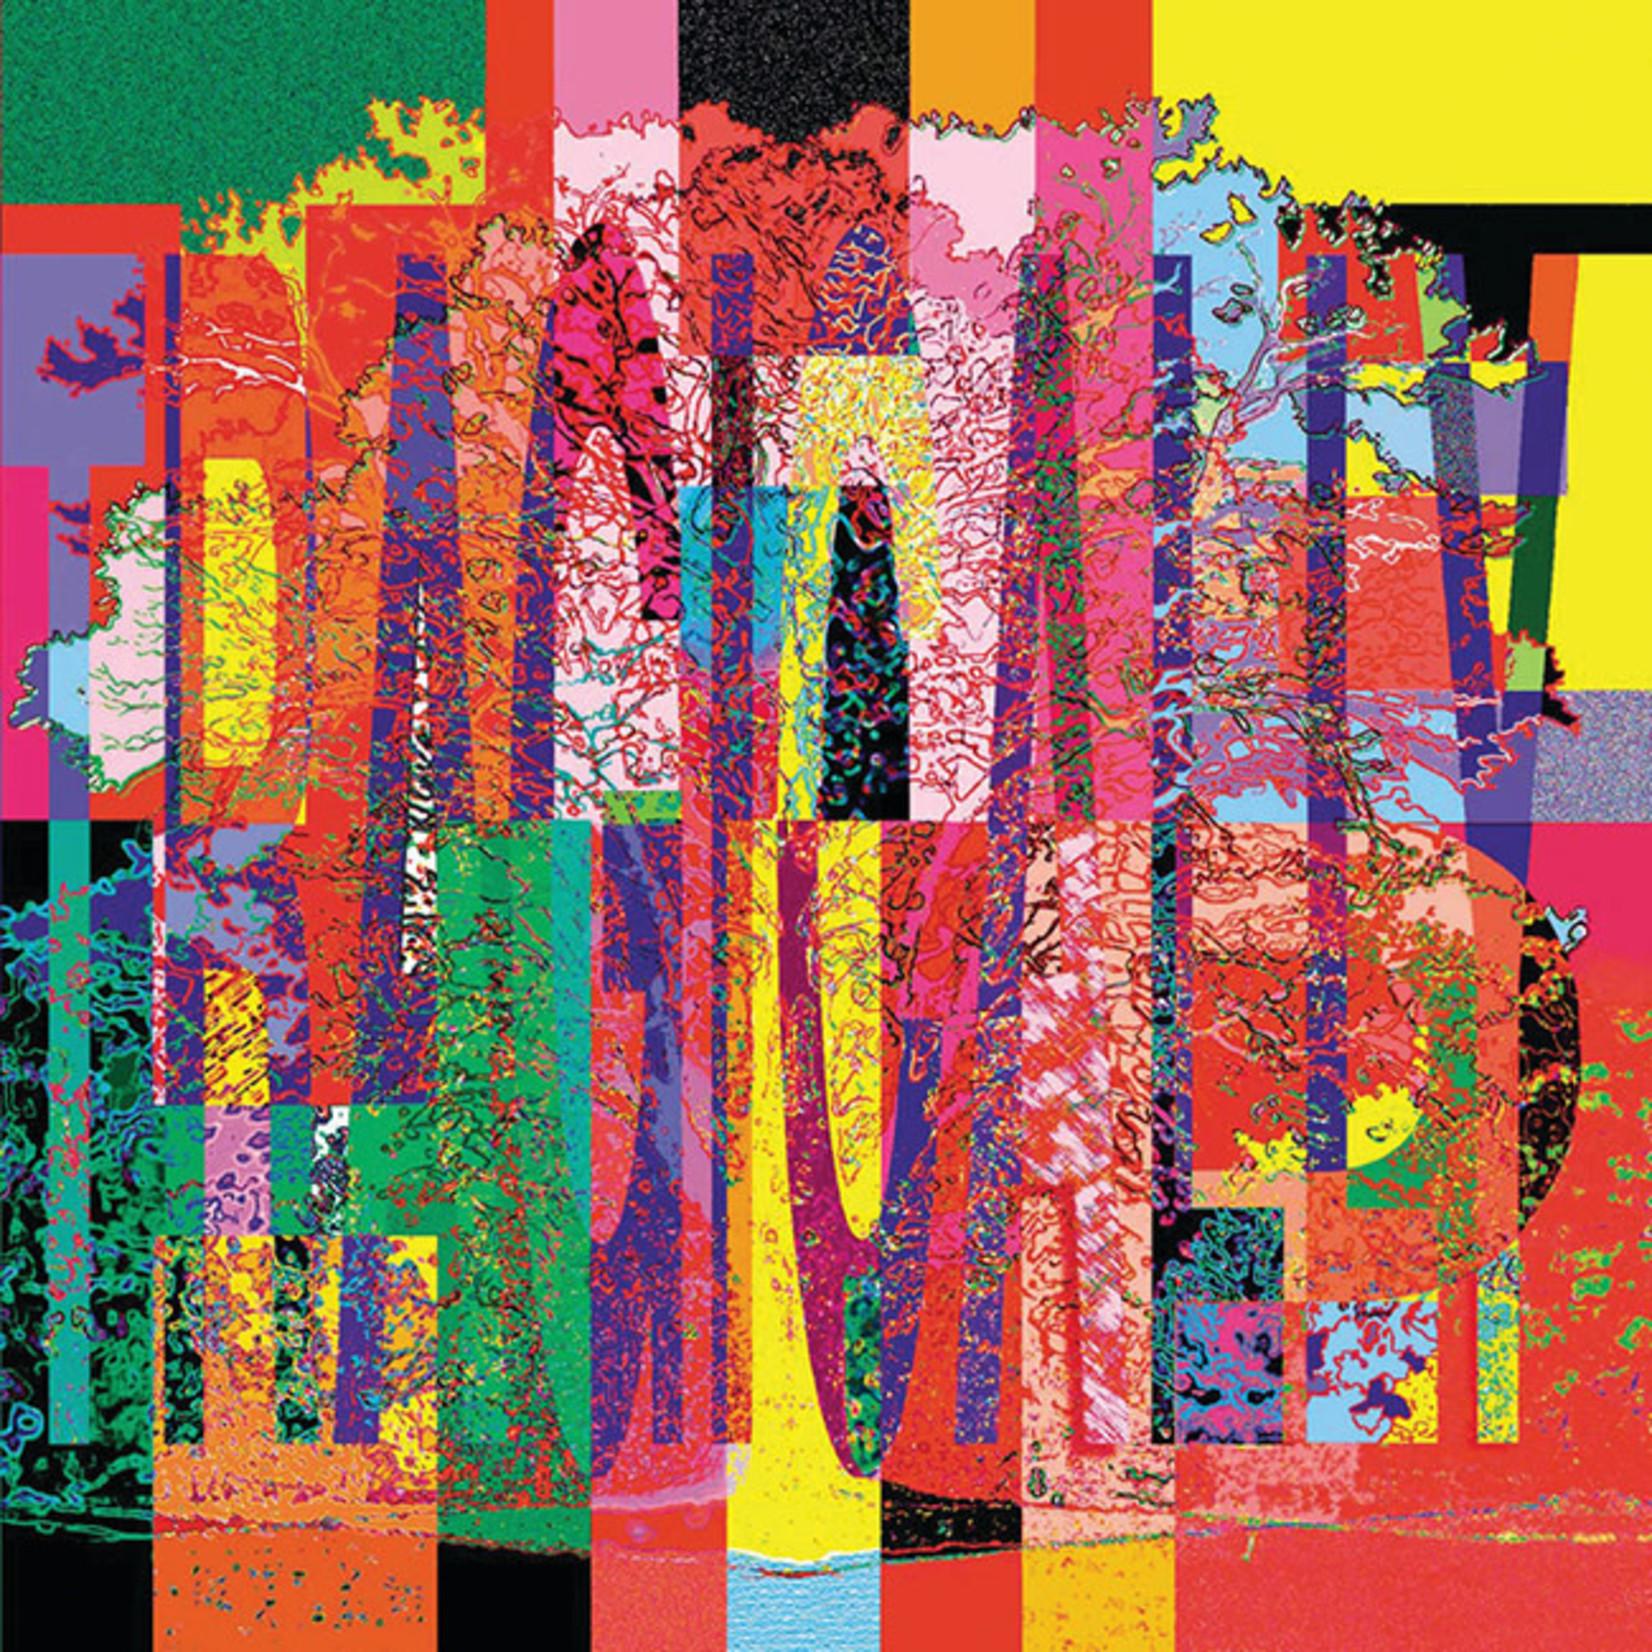 [New] Tragically Hip: Music Work (2LP)